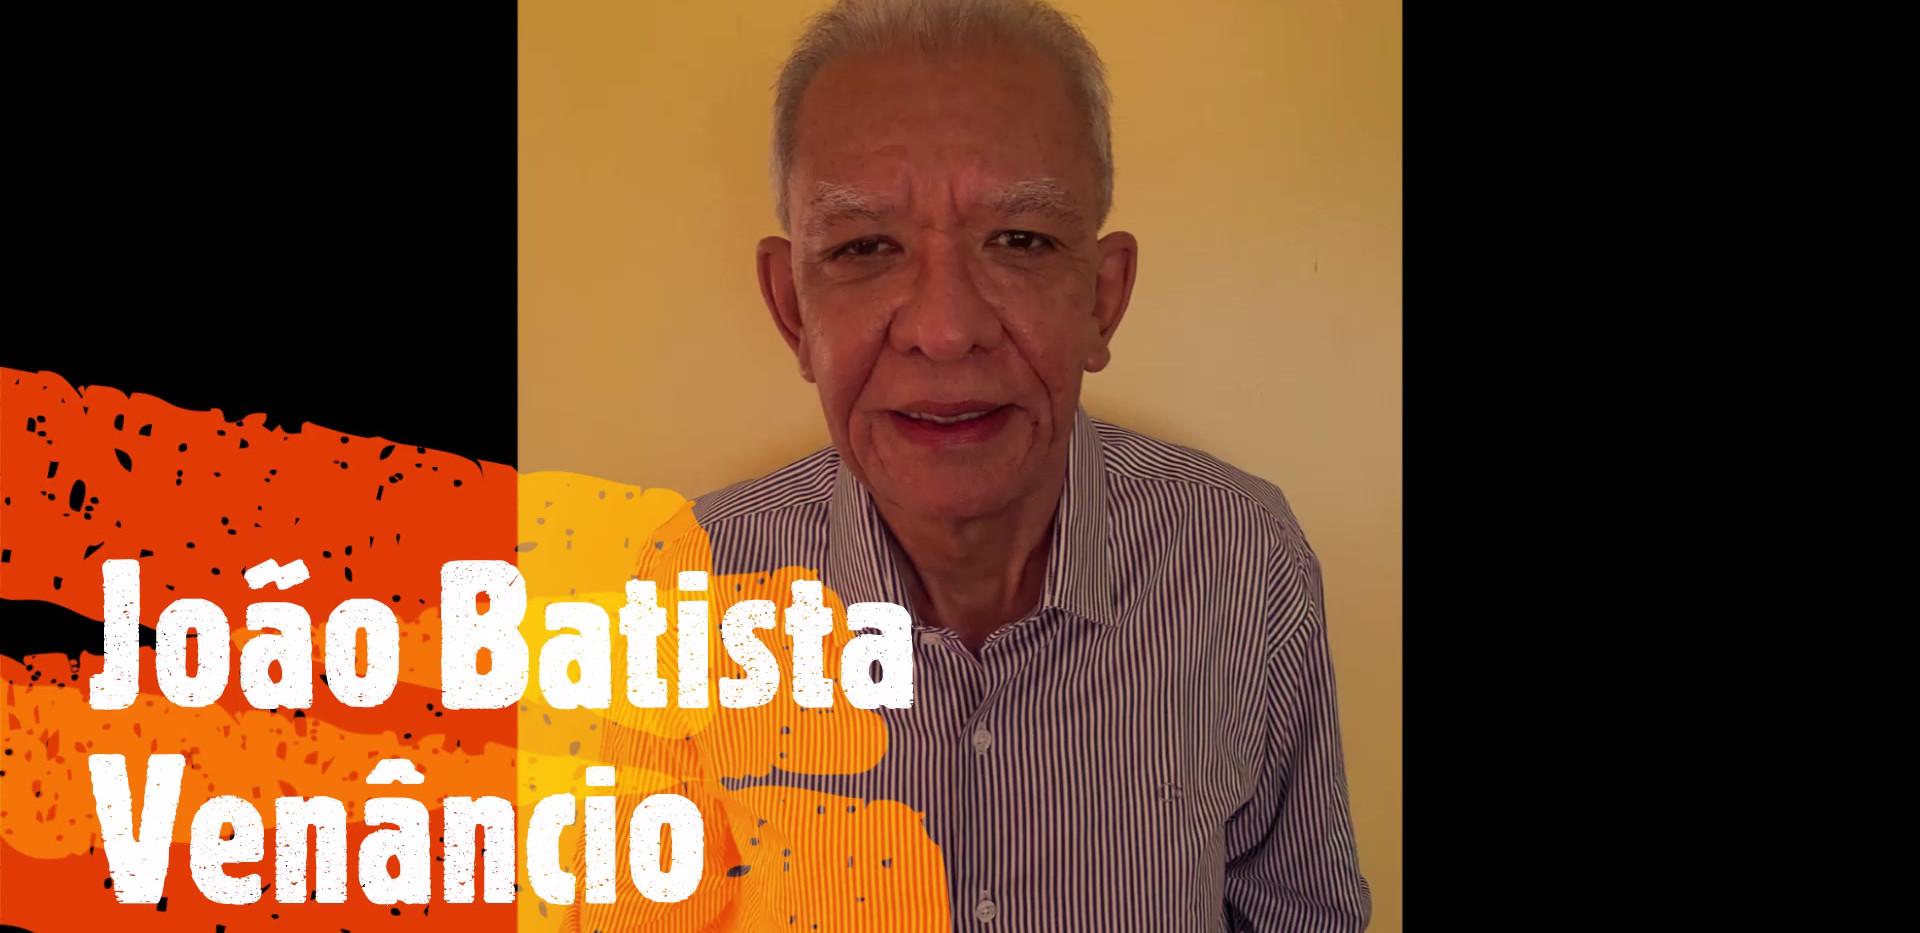 1 - João Batista Venâncio